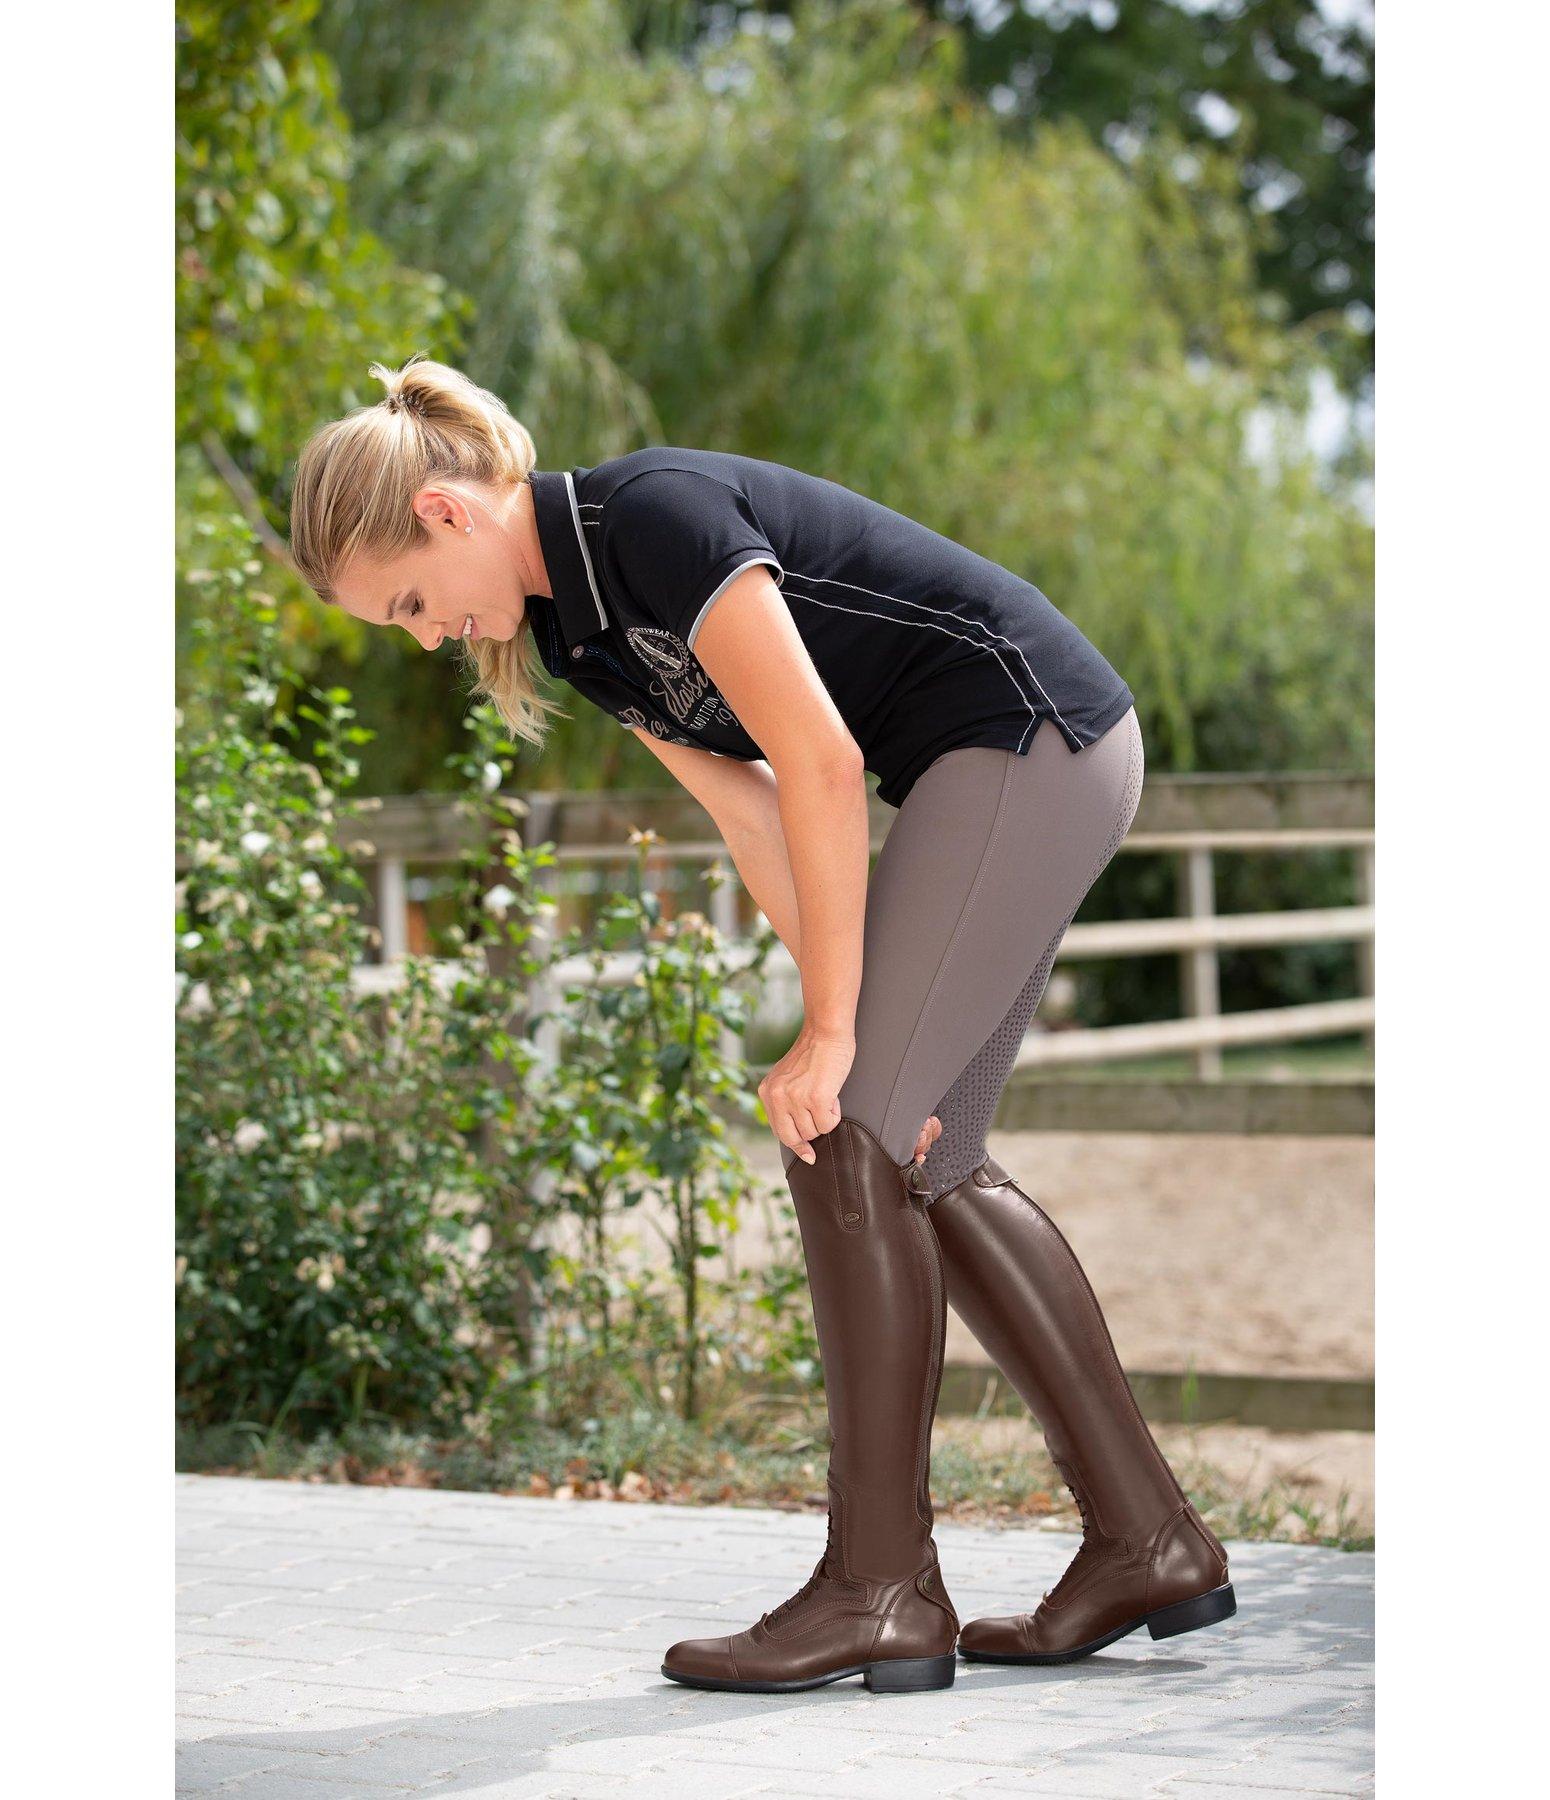 d6469e4d1 Felix Bühler Long Riding Boots Milano Cognac - 740830-4-CG - 2